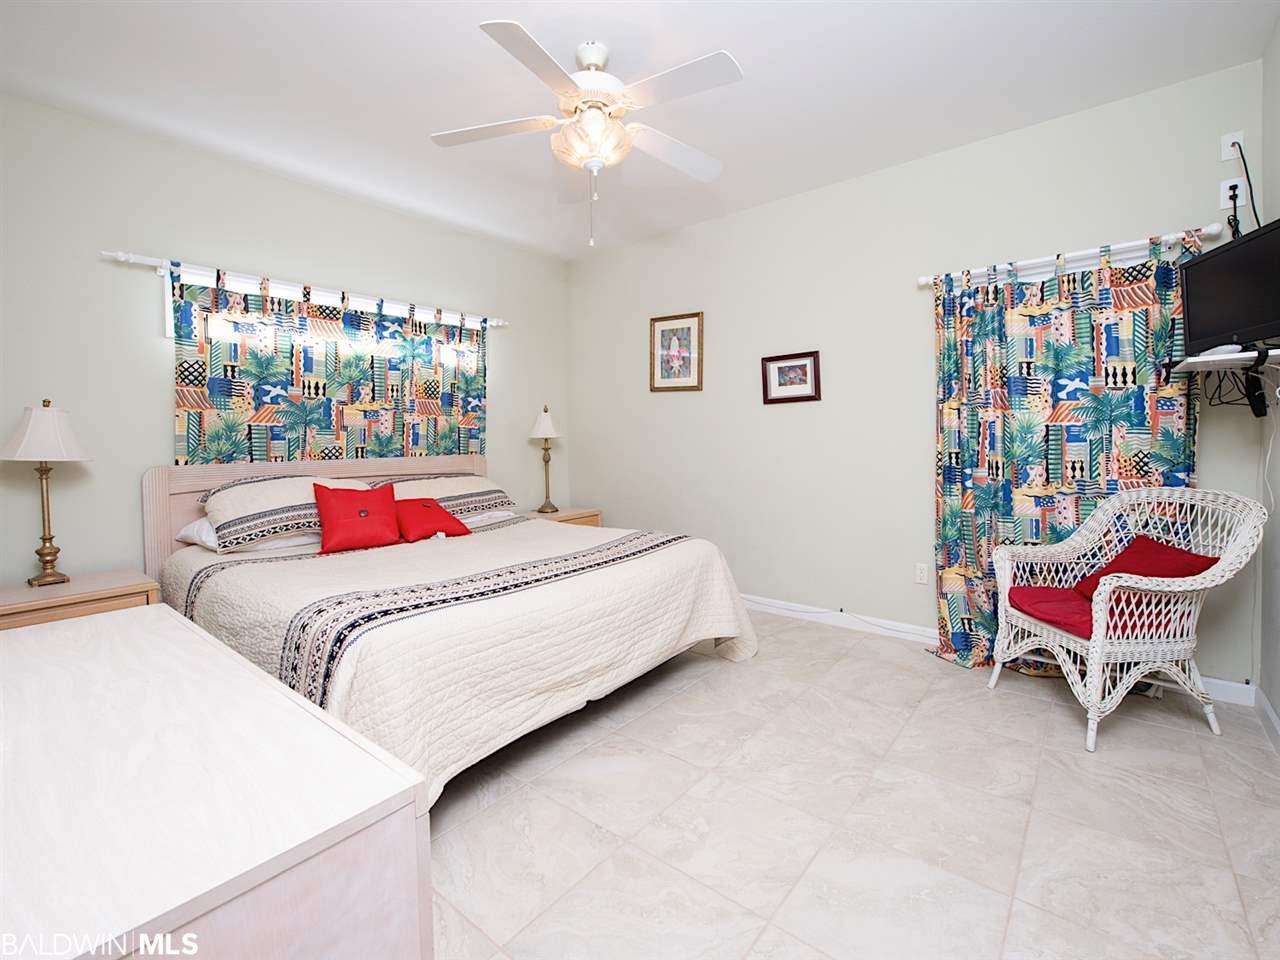 543 Vacation Lane #A, Gulf Shores, AL 36542